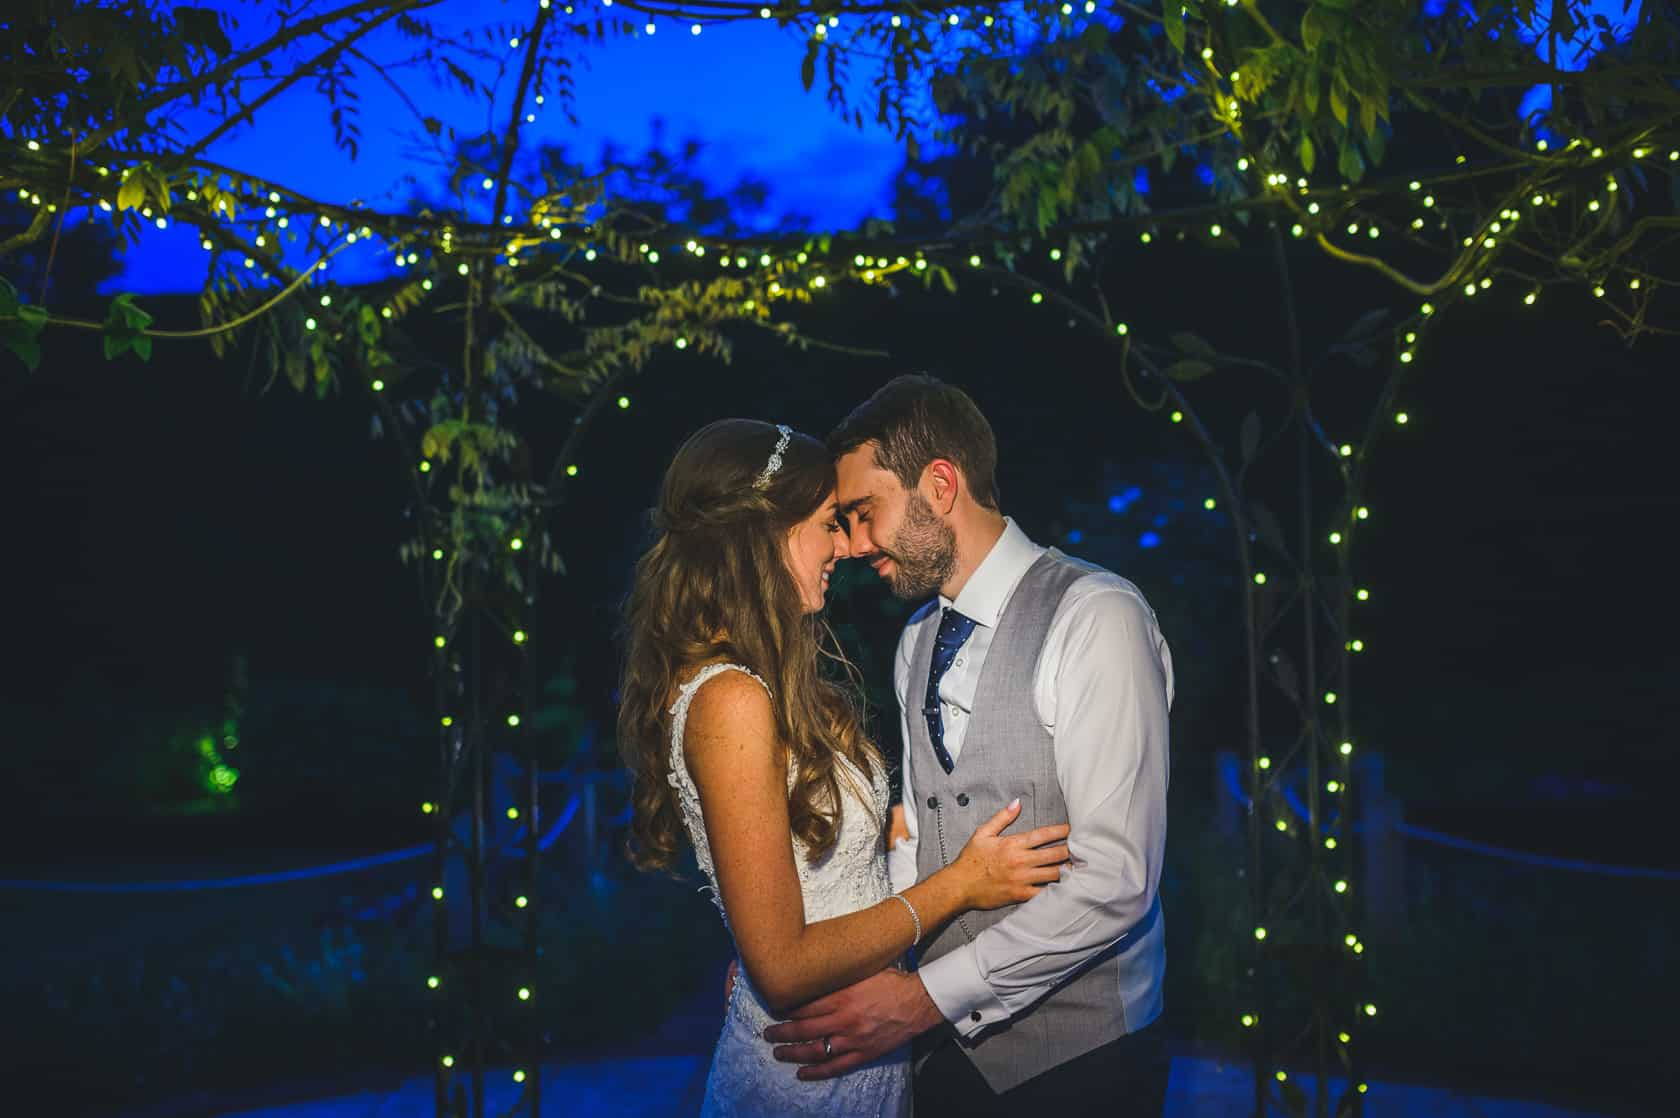 Best_Wedding_Photography_2019_Wedding-Photographer-Essex_020